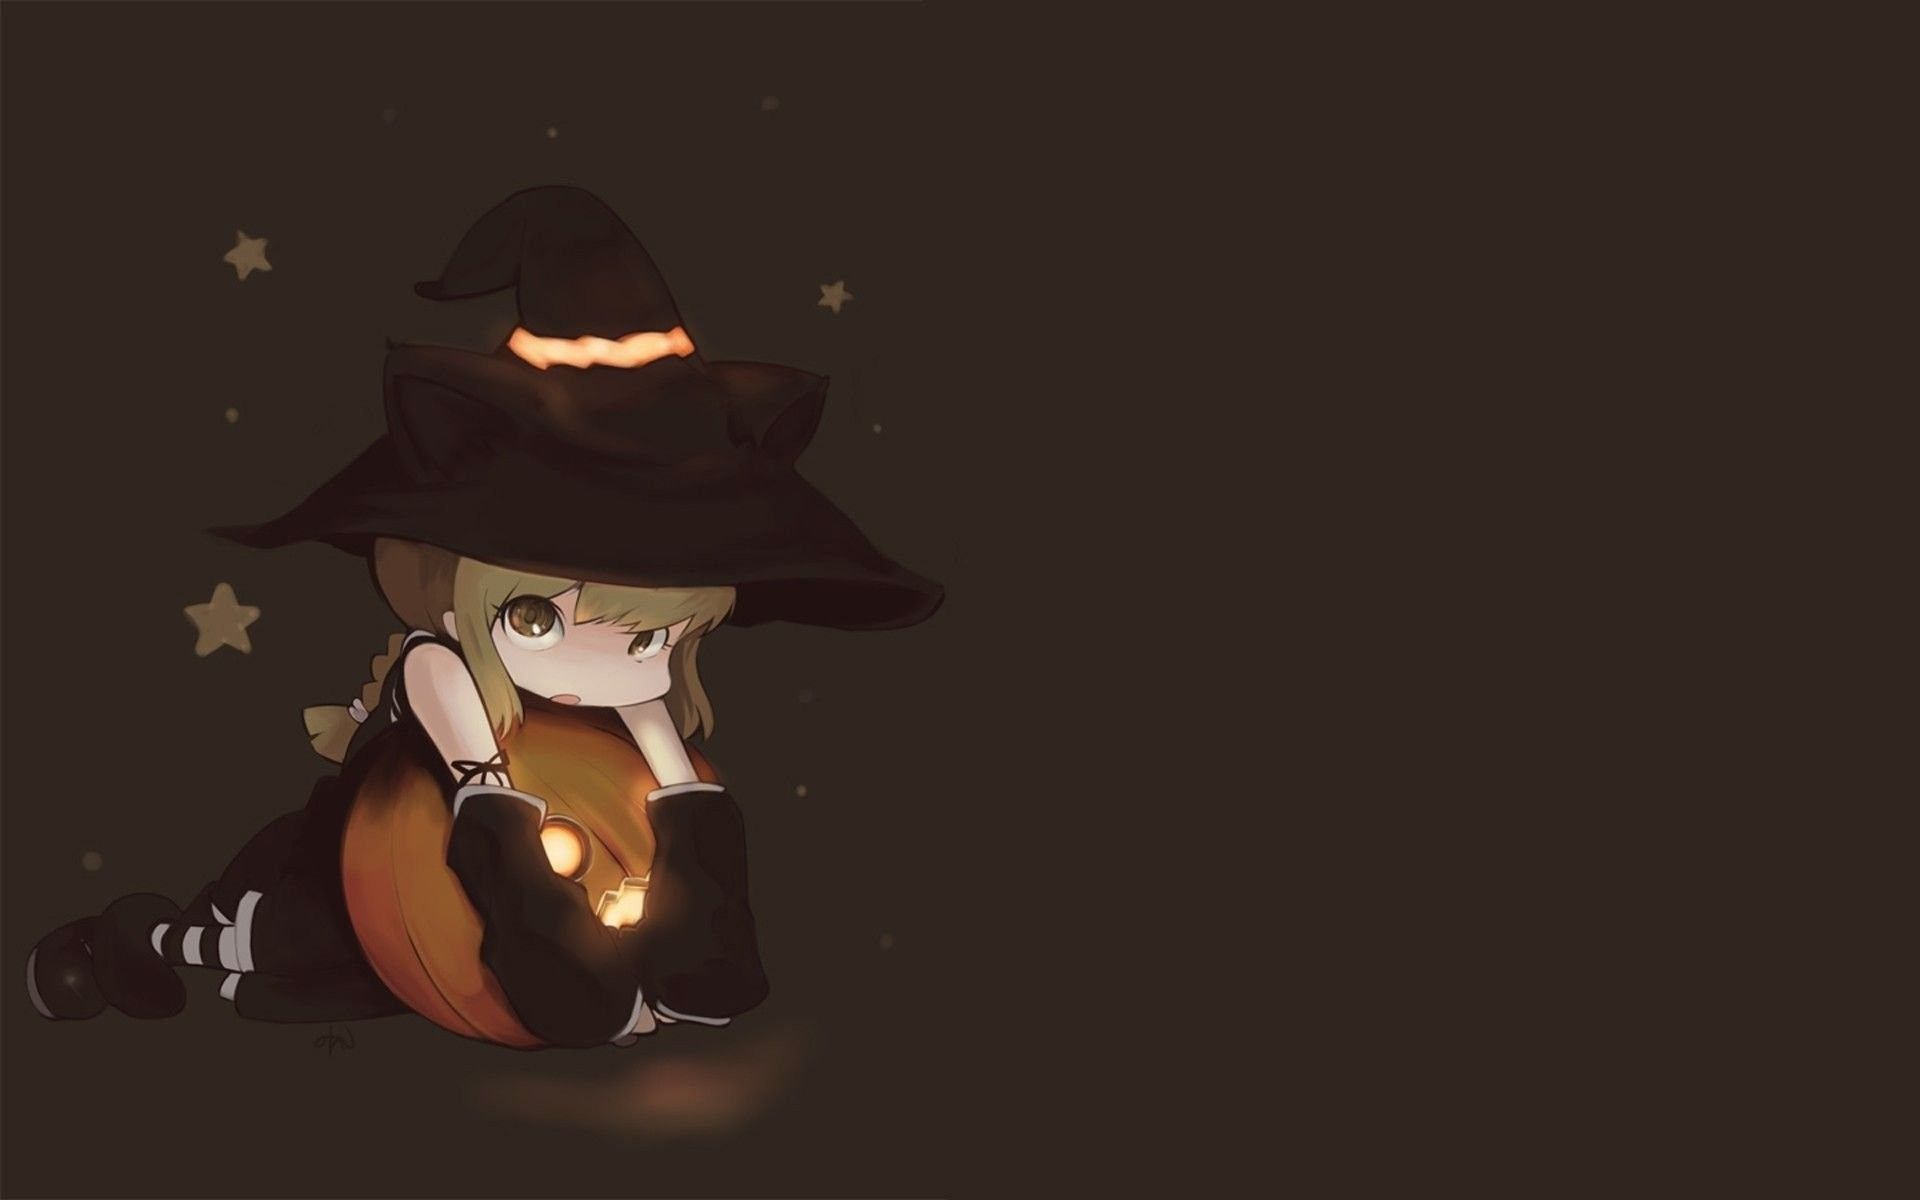 Cute Halloween Anime Wallpapers Top Free Cute Halloween Anime Backgrounds Wallpaperaccess